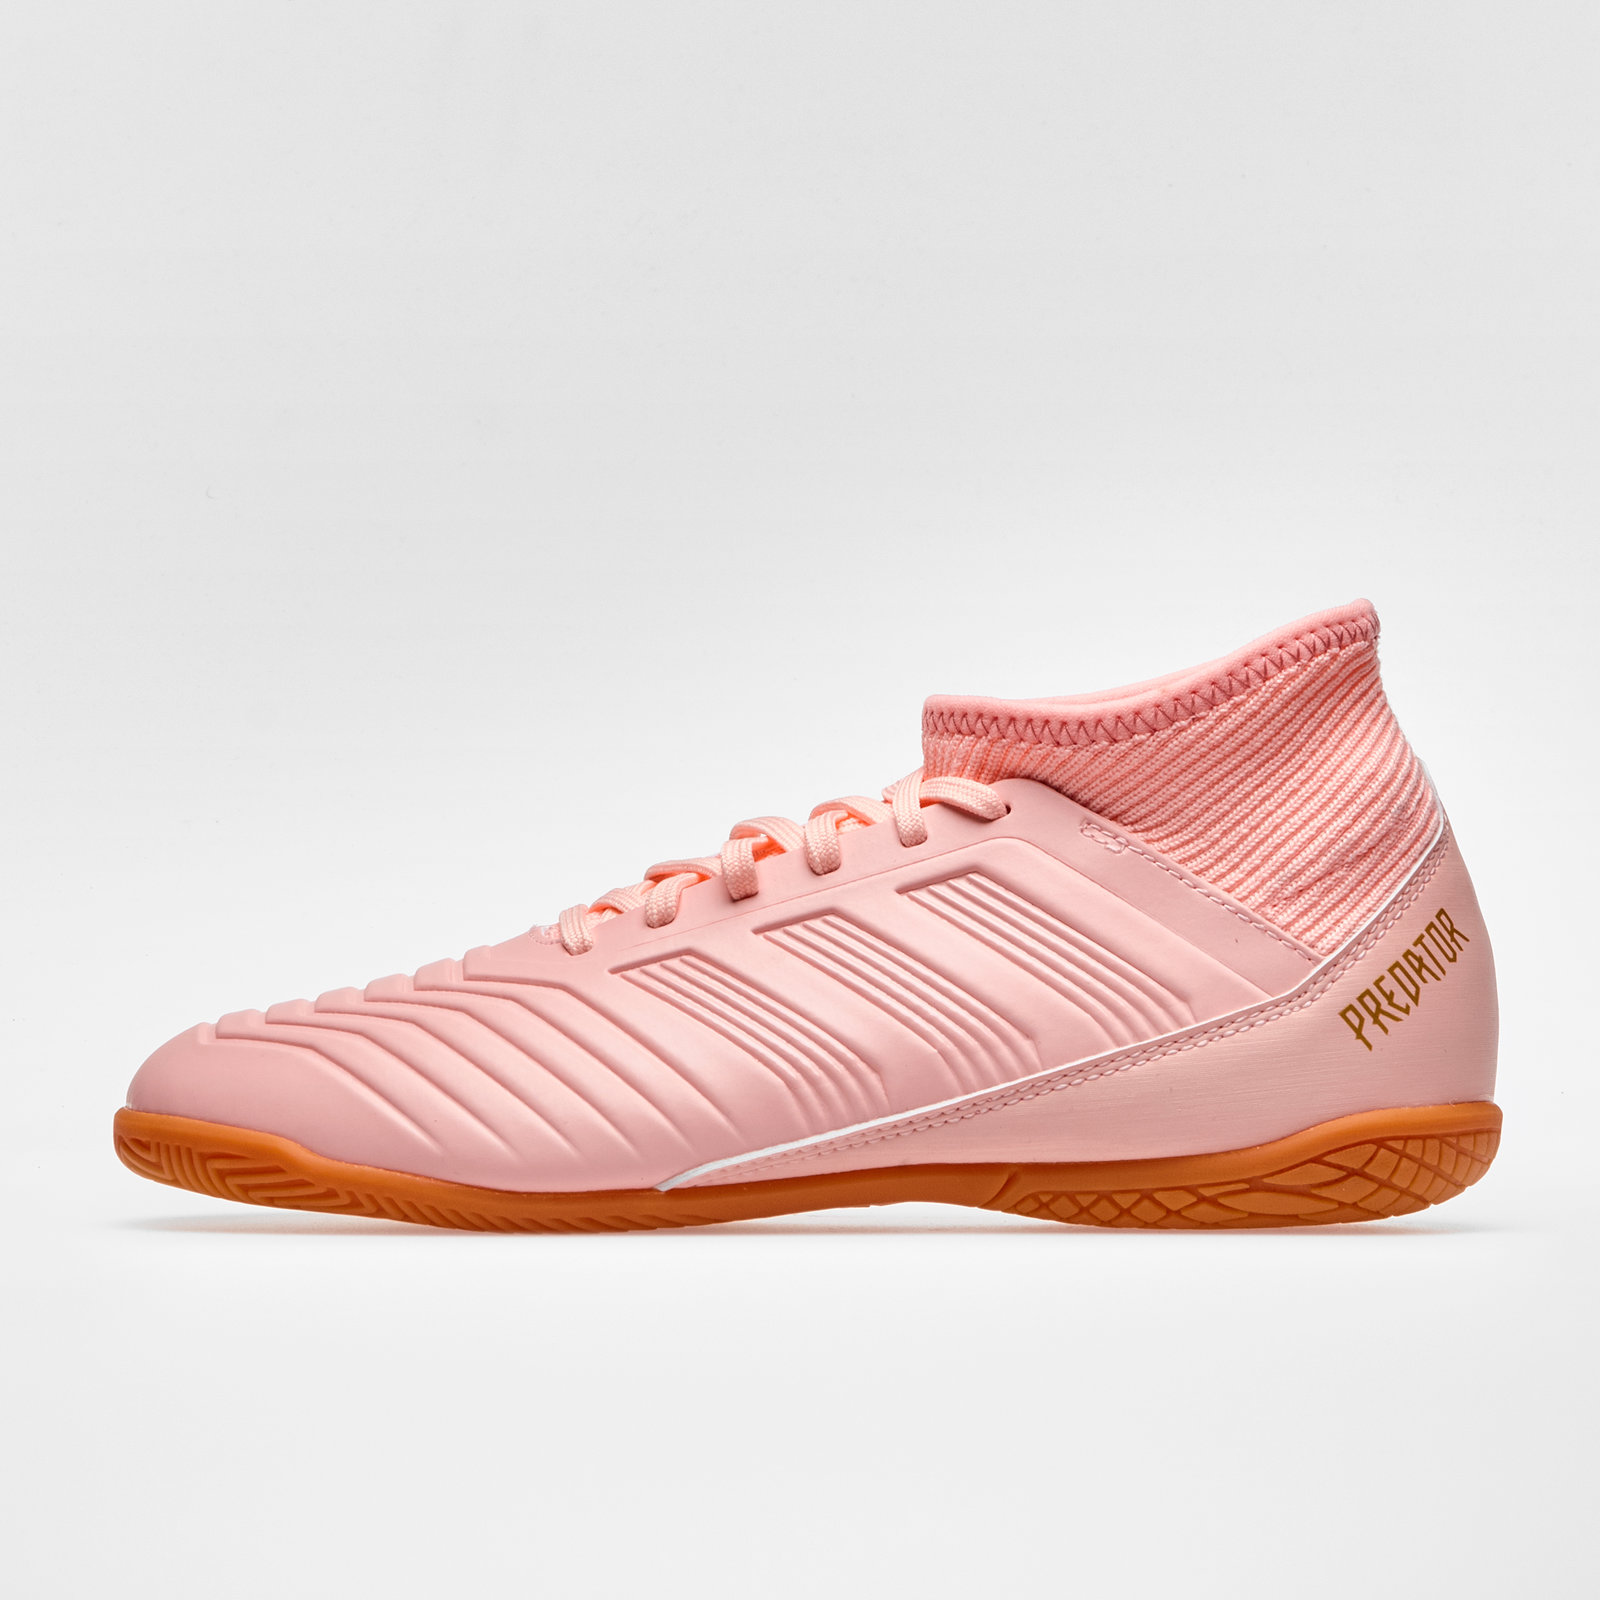 a3d849942 adidas Predator Tango 18.3 Indoor Kids Football Boots Studs Trainers Sports  Shoe